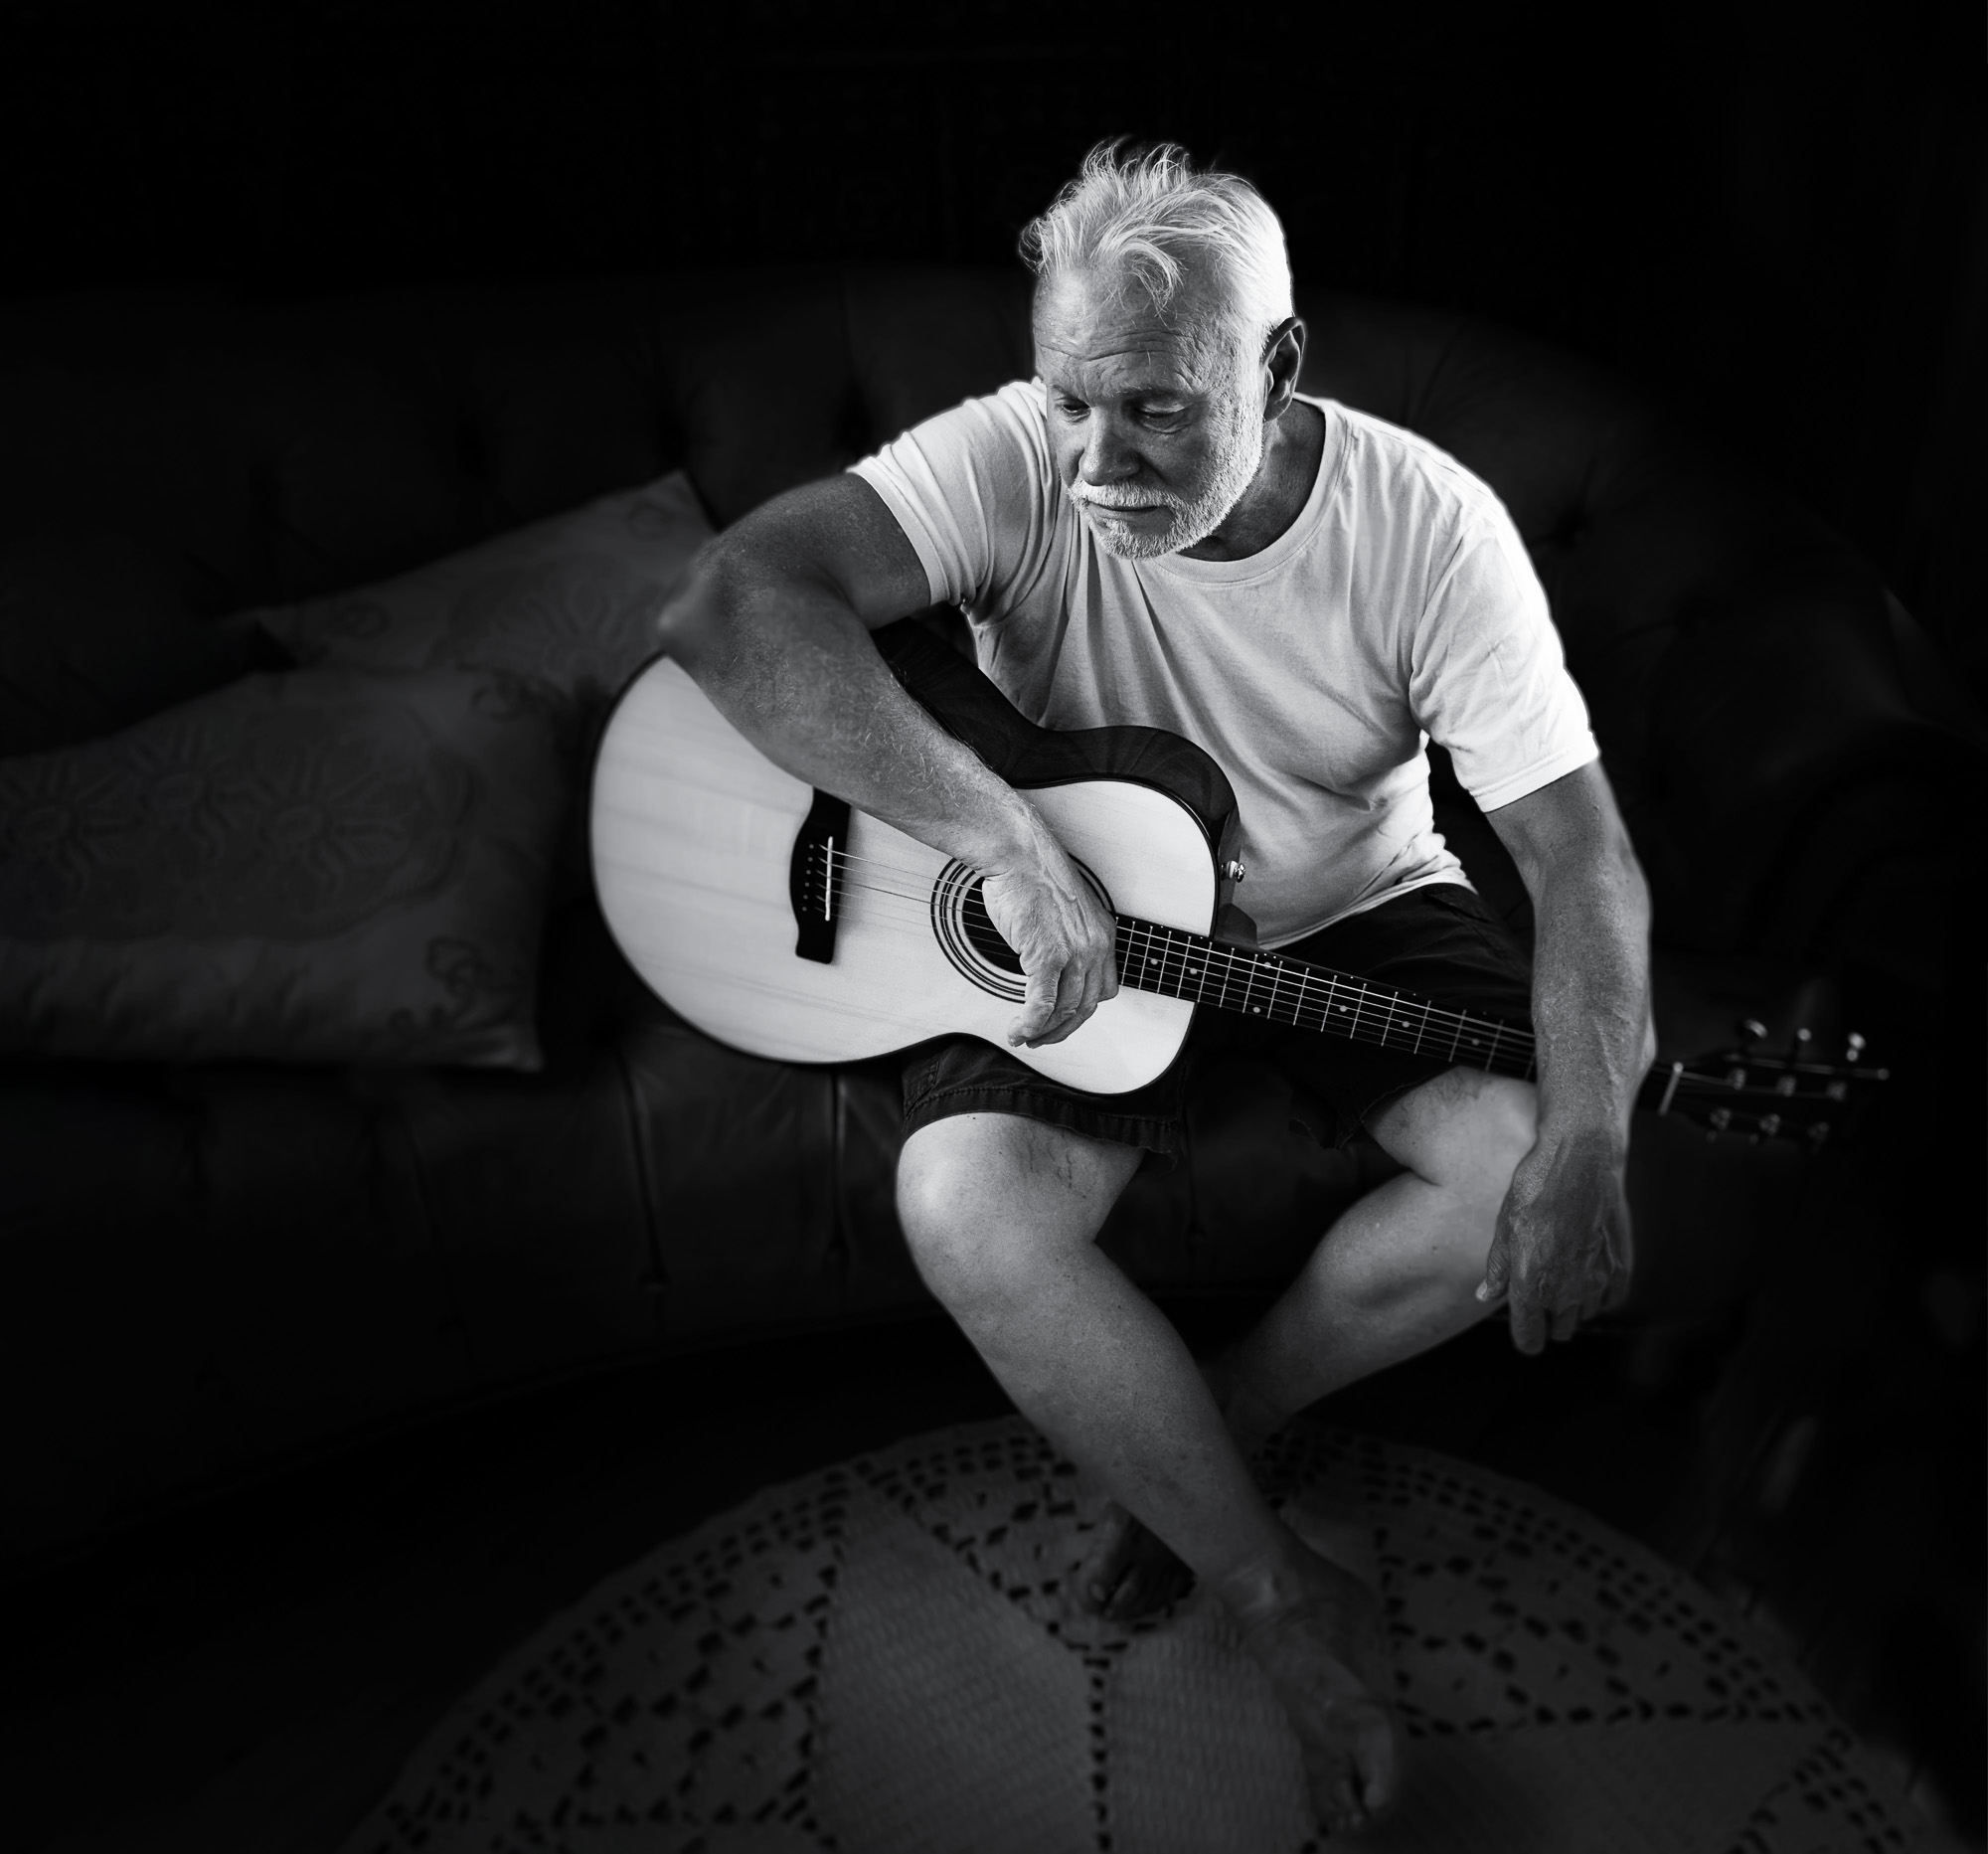 black-and-white-portrait-ReginaMeloPhotography.jpg